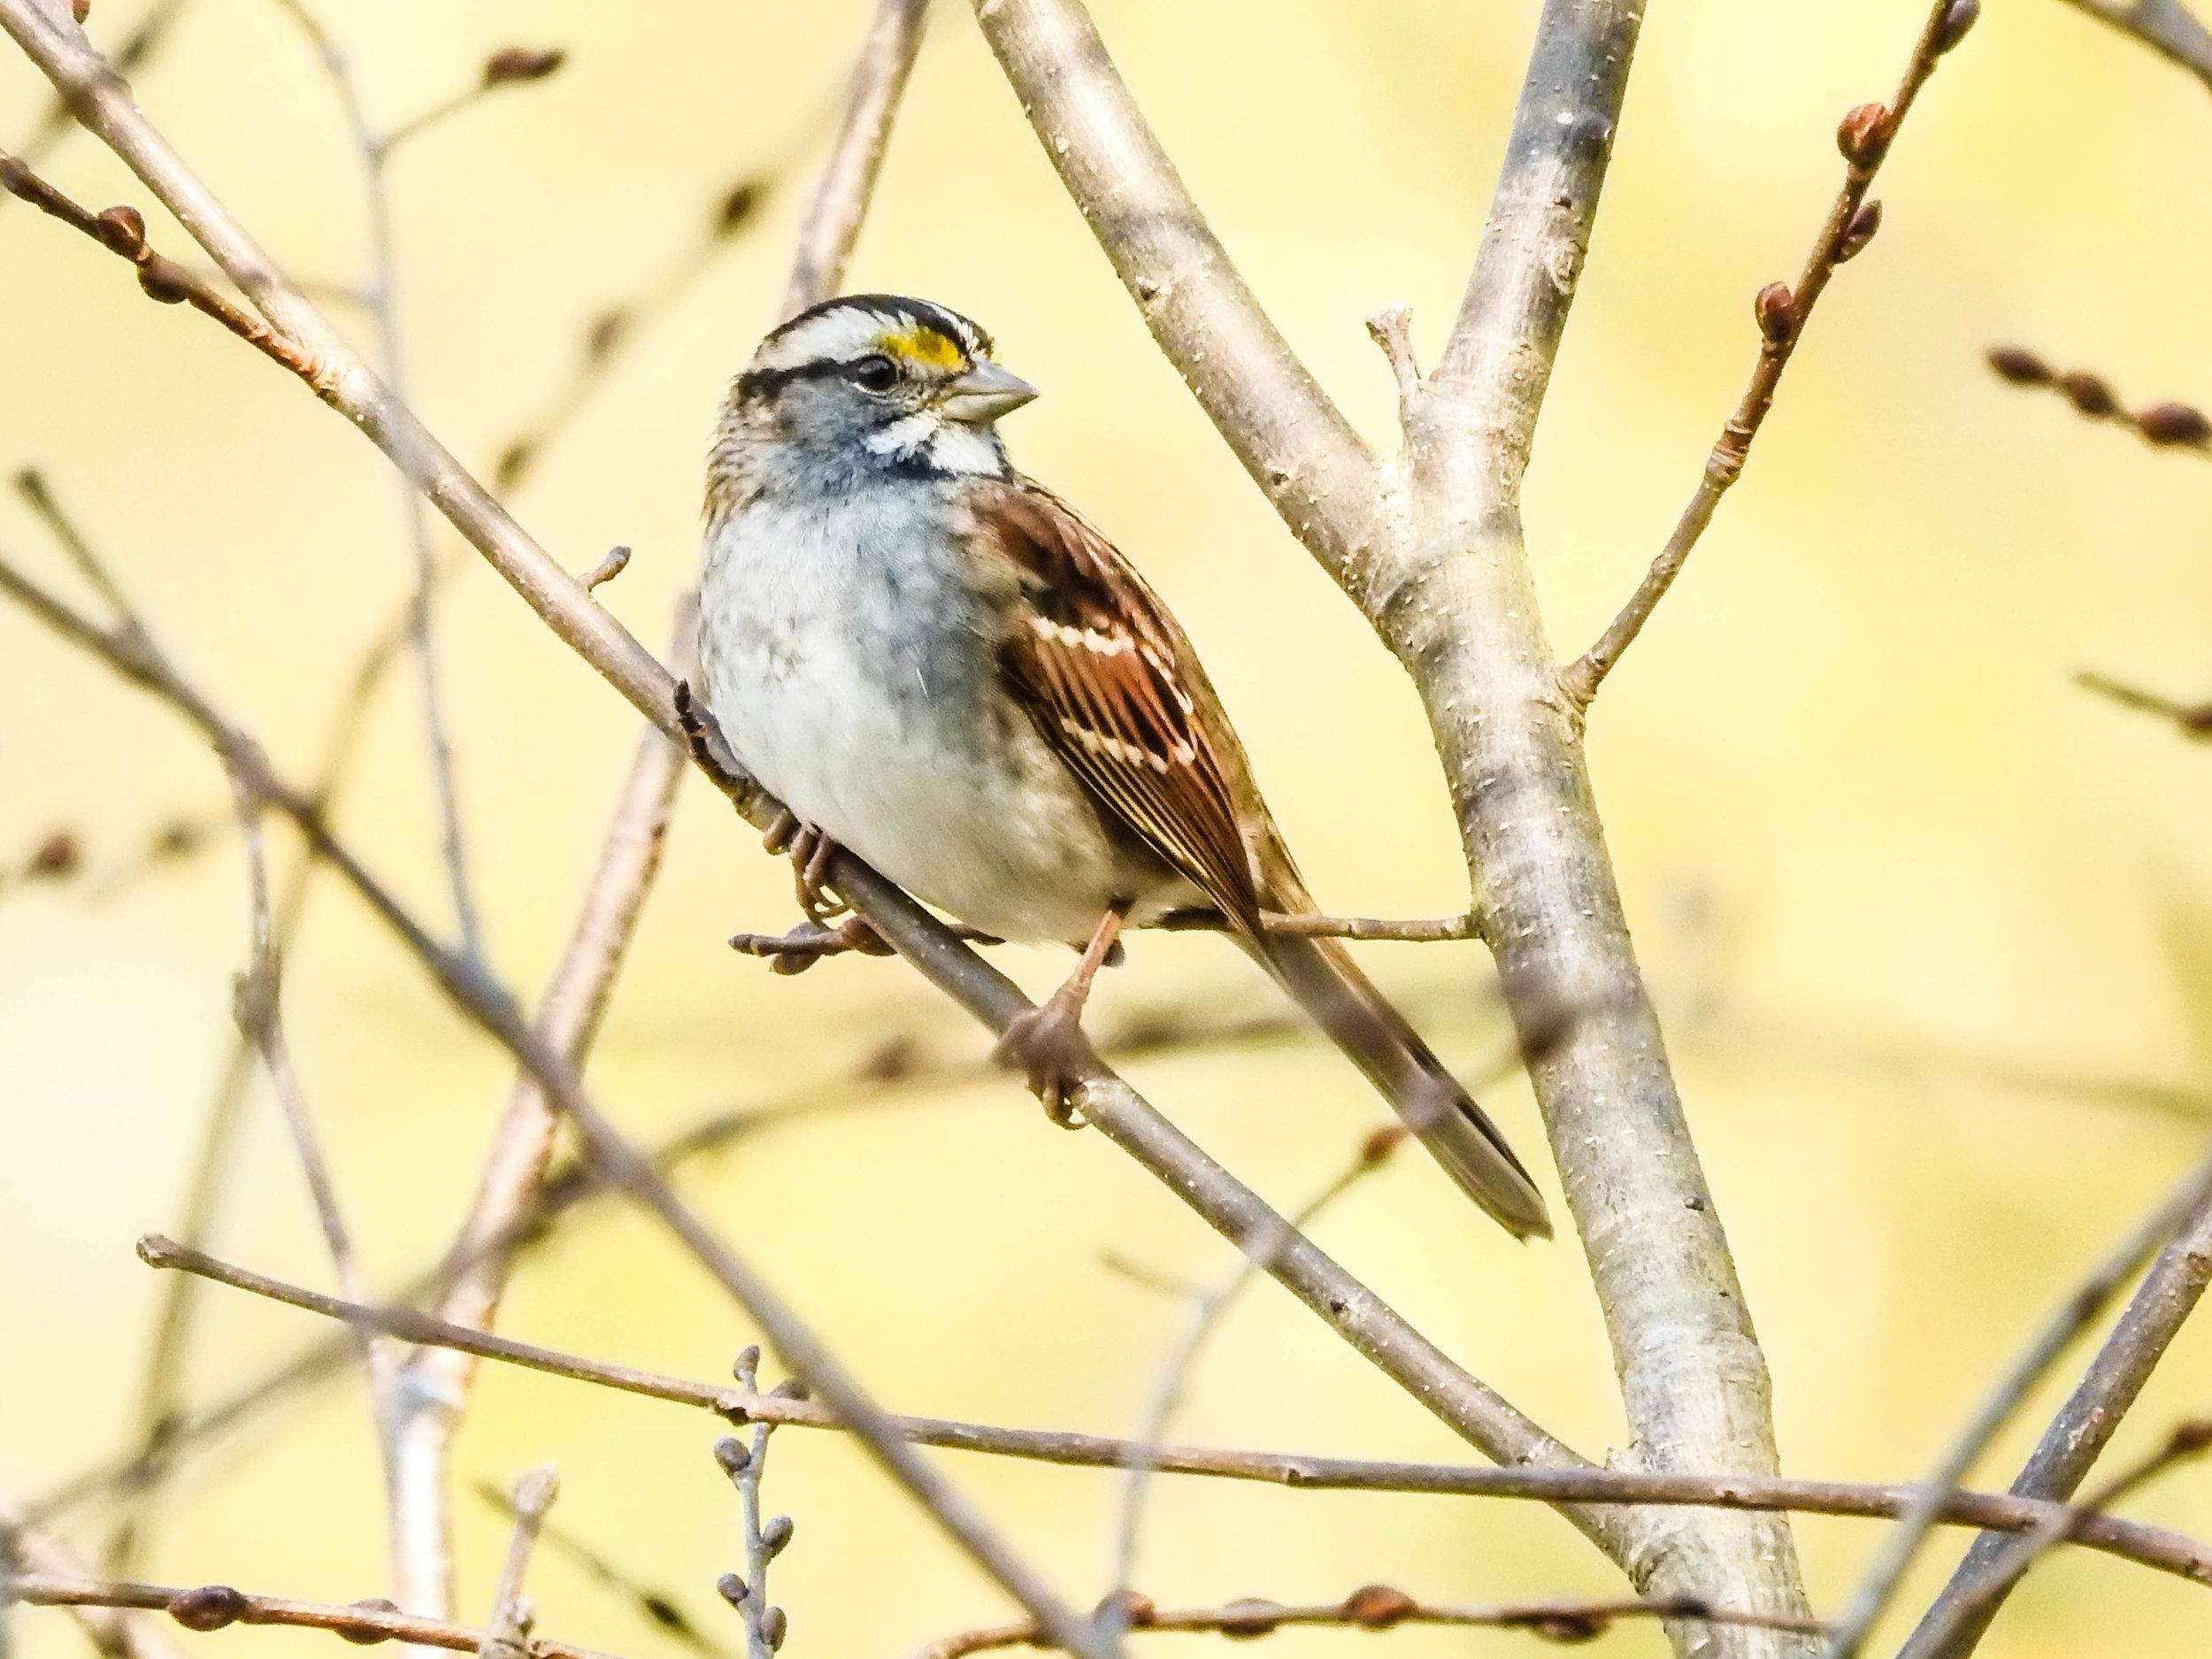 White-throated Sparrow, white-striped